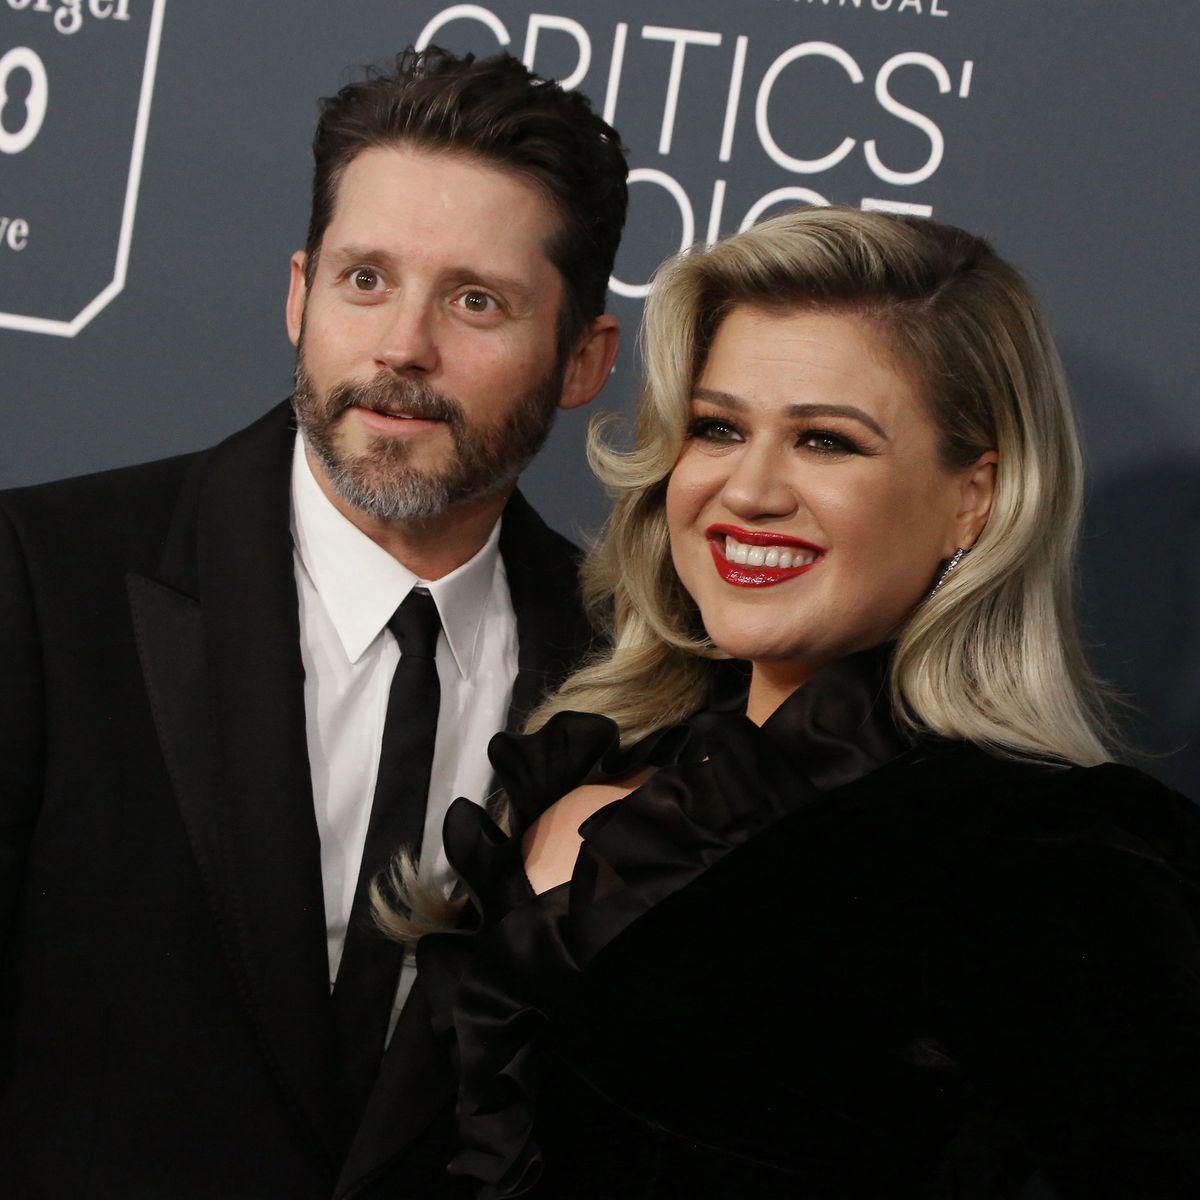 Kelly Clarkson Divorces Husband Manager Brandon Blackstock